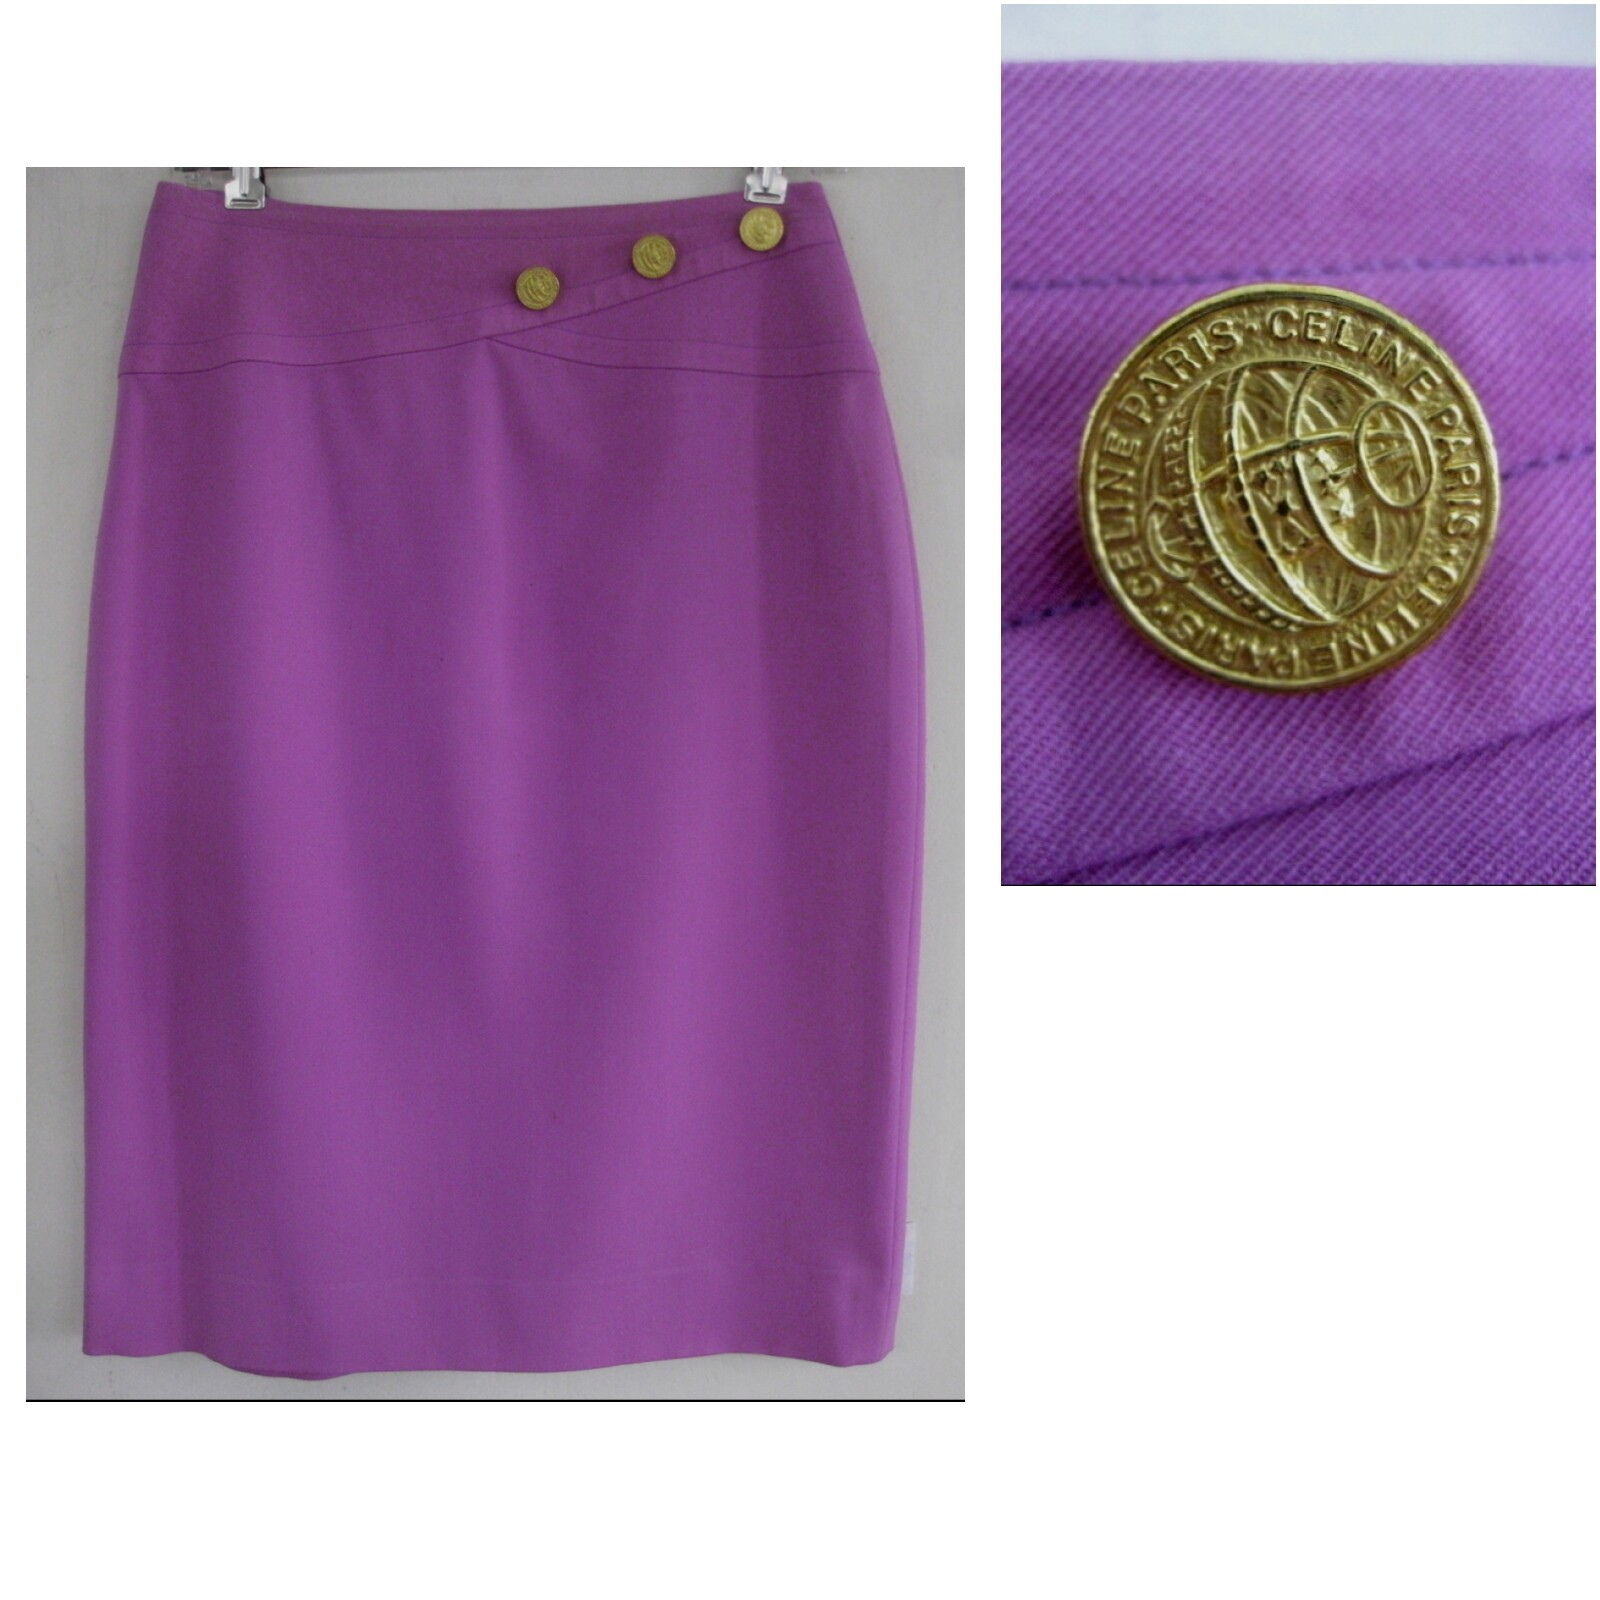 Celine Paris Pencil skirt M Wool Purple France gold buttons Yoke Straight Lined